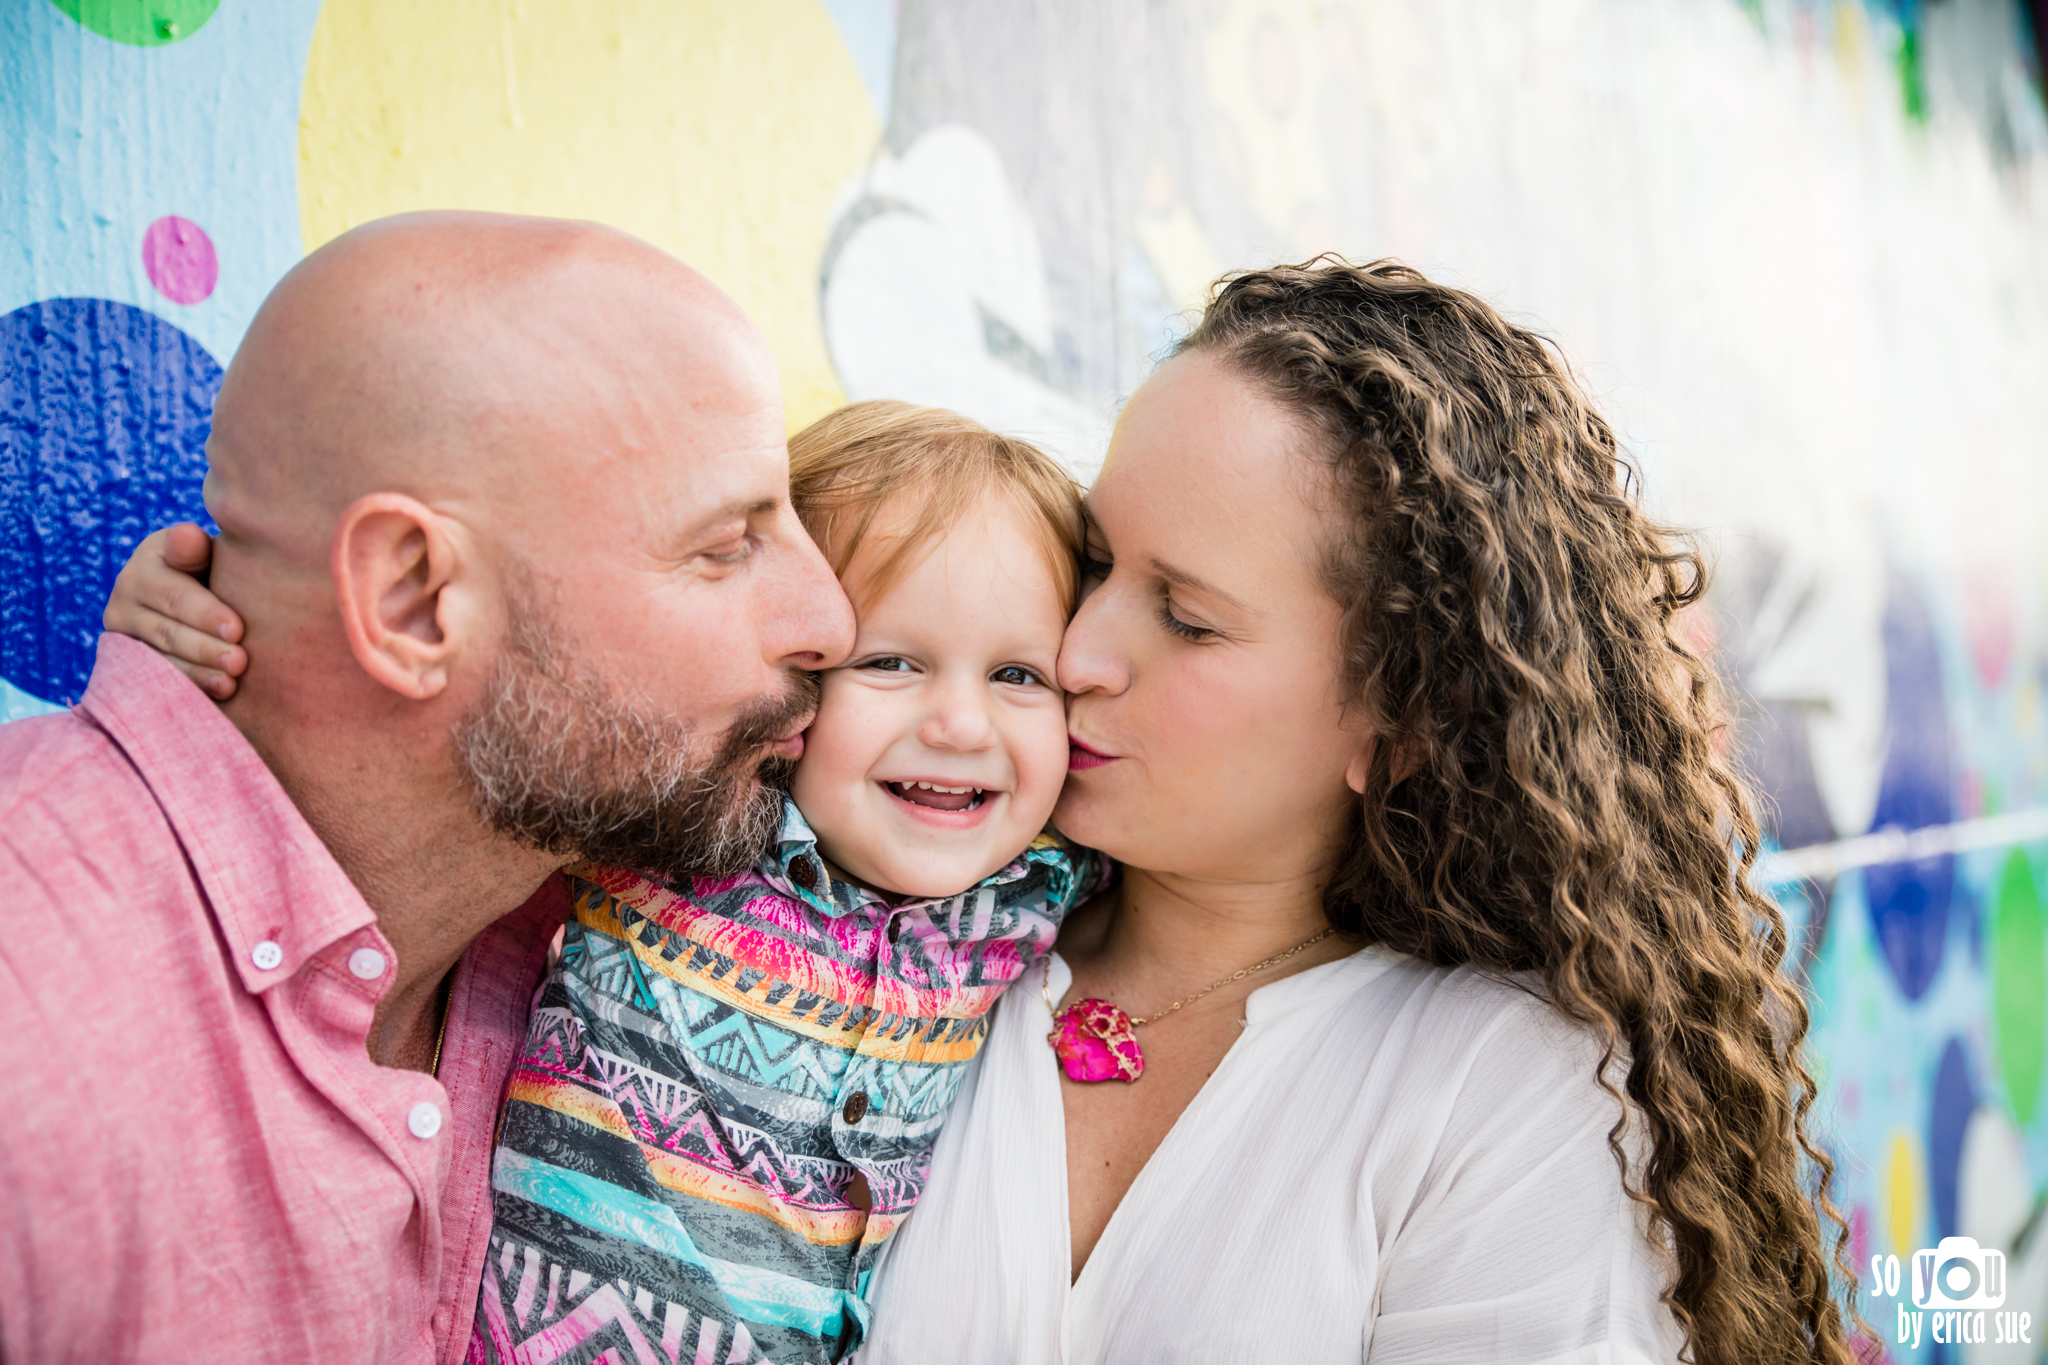 so-you-by-erica-wynwood-photo-shoot-family-photography-miami-7449.jpg